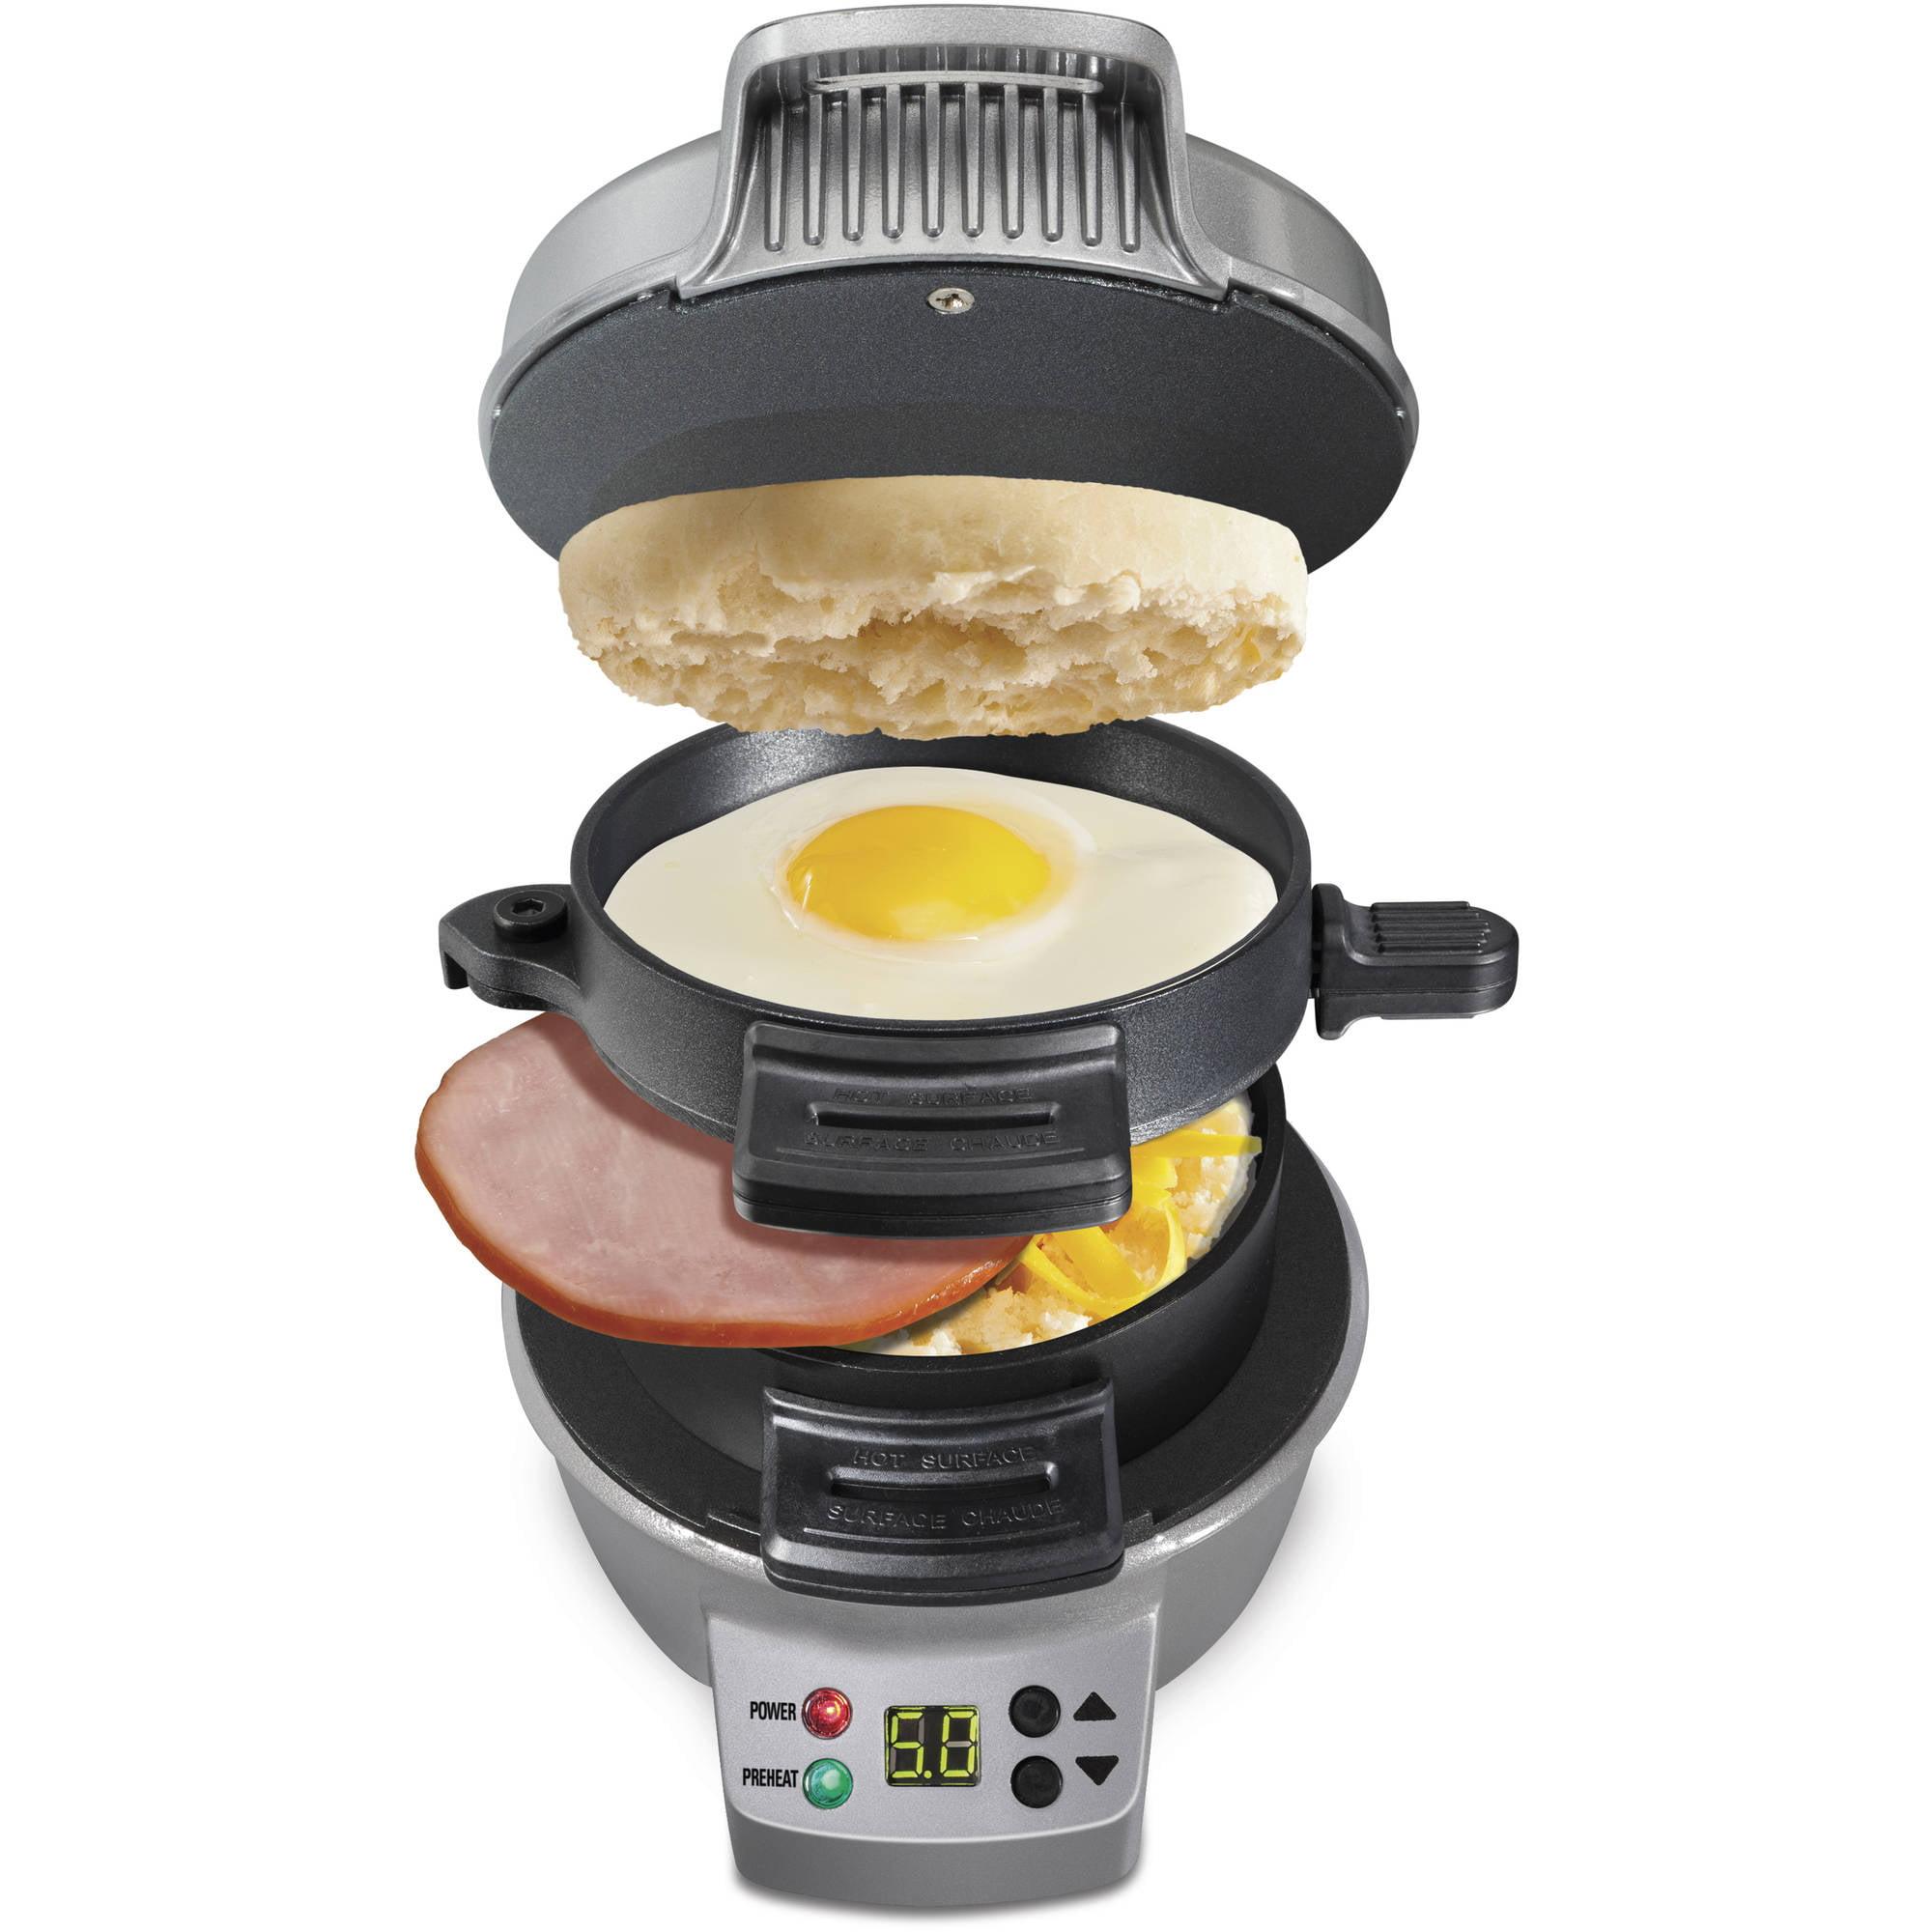 Hamilton Beach Breakfast Sandwich Maker with Count Down Timer | Model#  25478 - Walmart.com